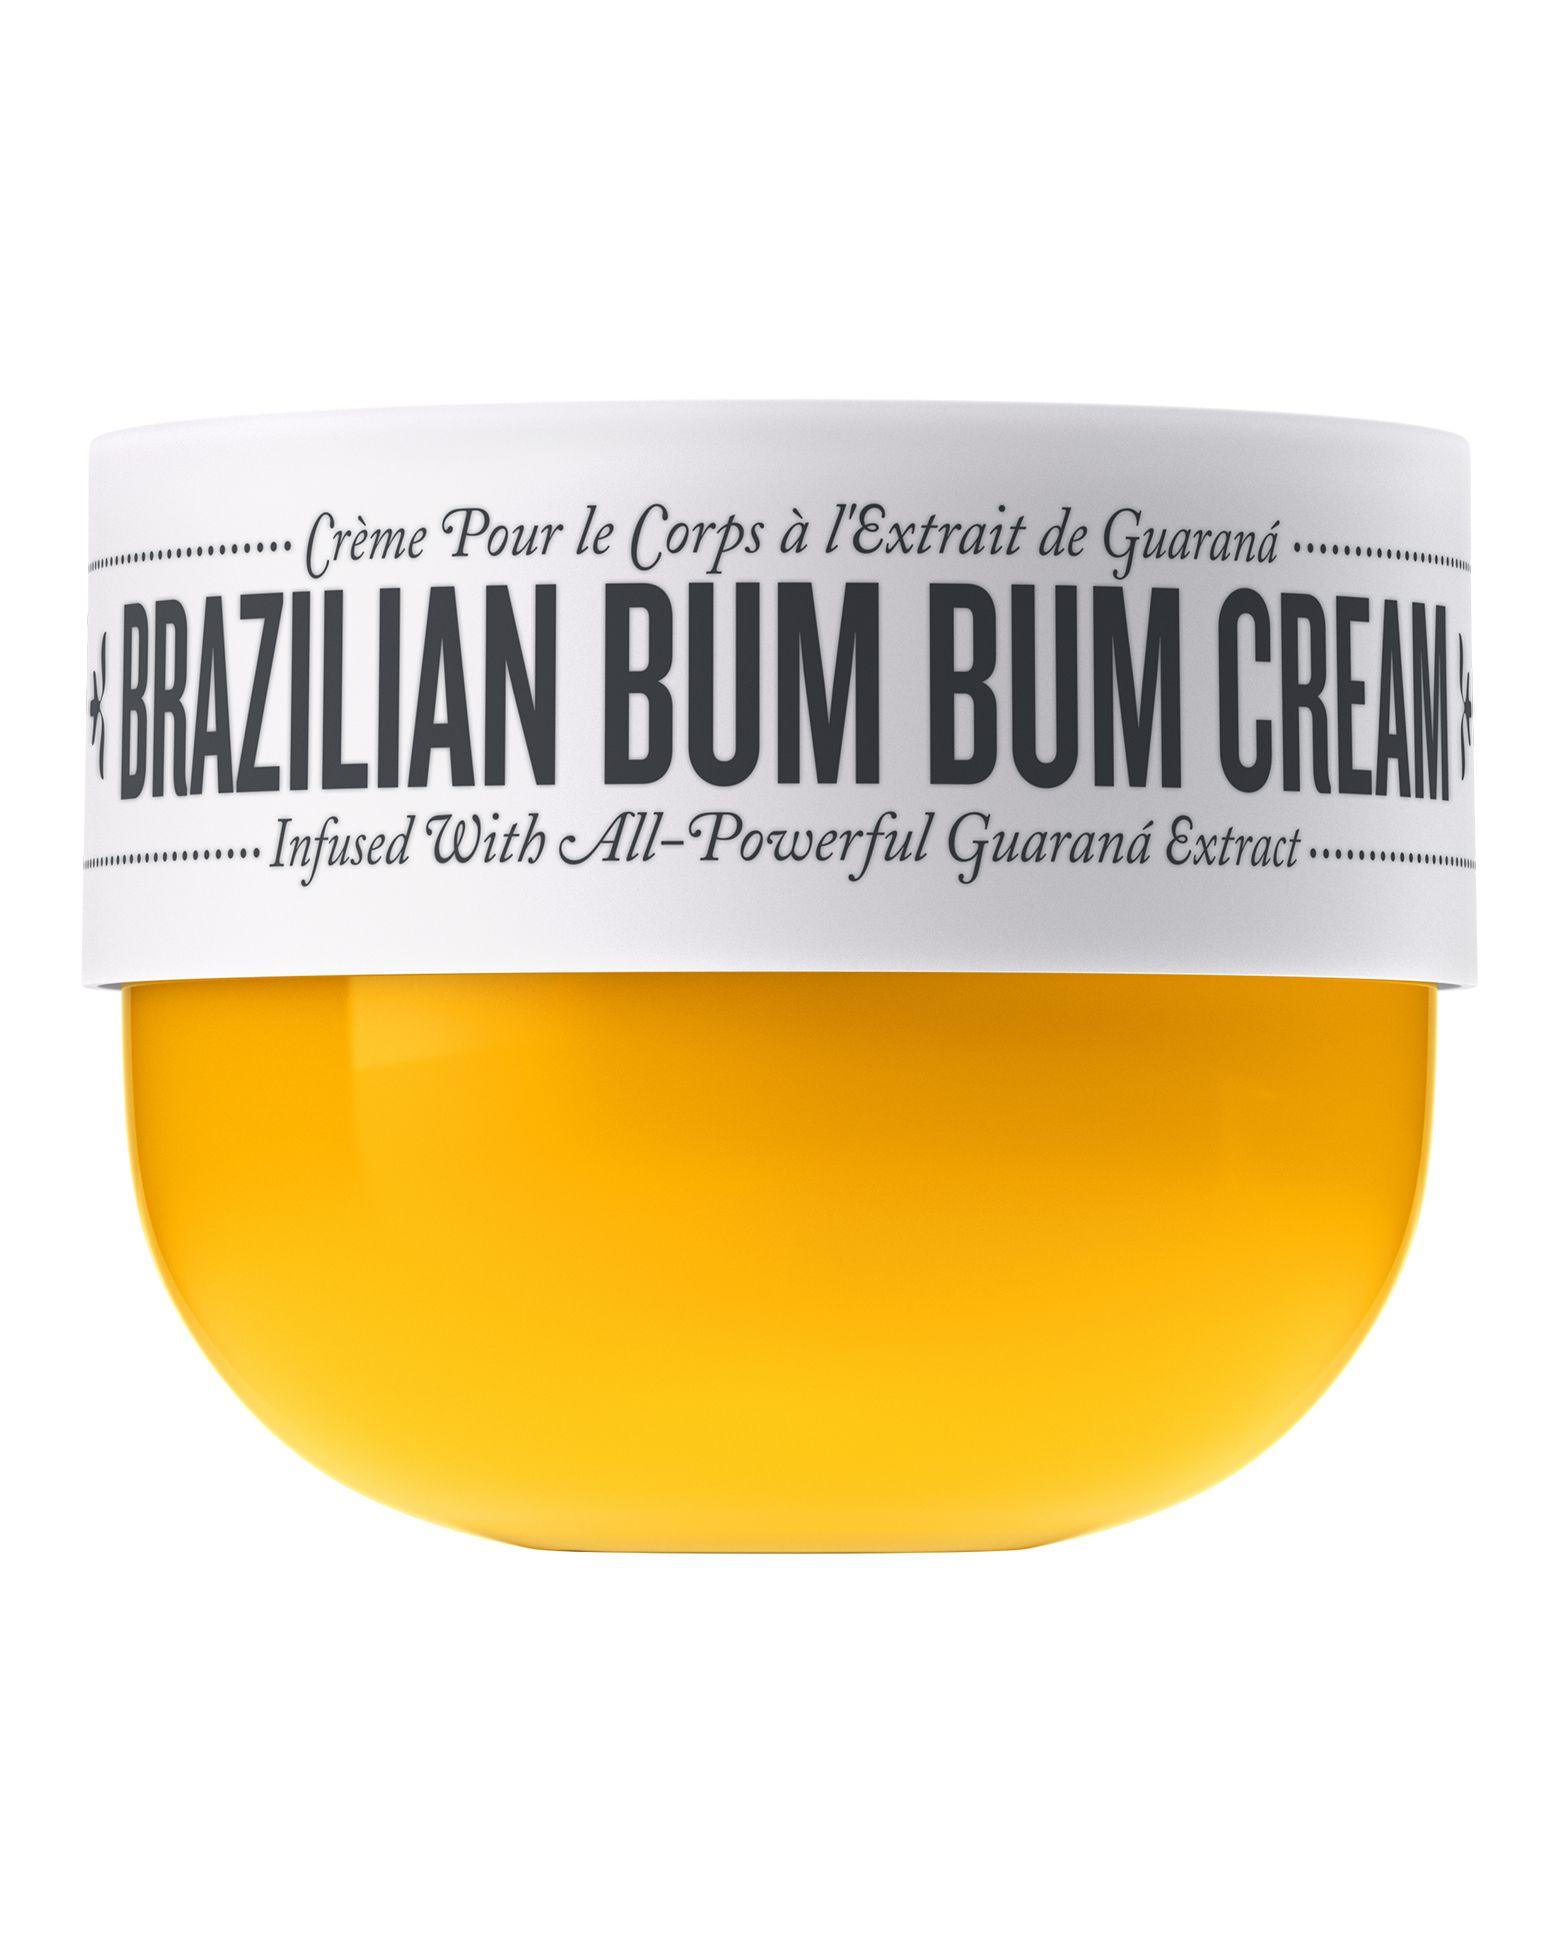 Brazilian Bum Bum Cream